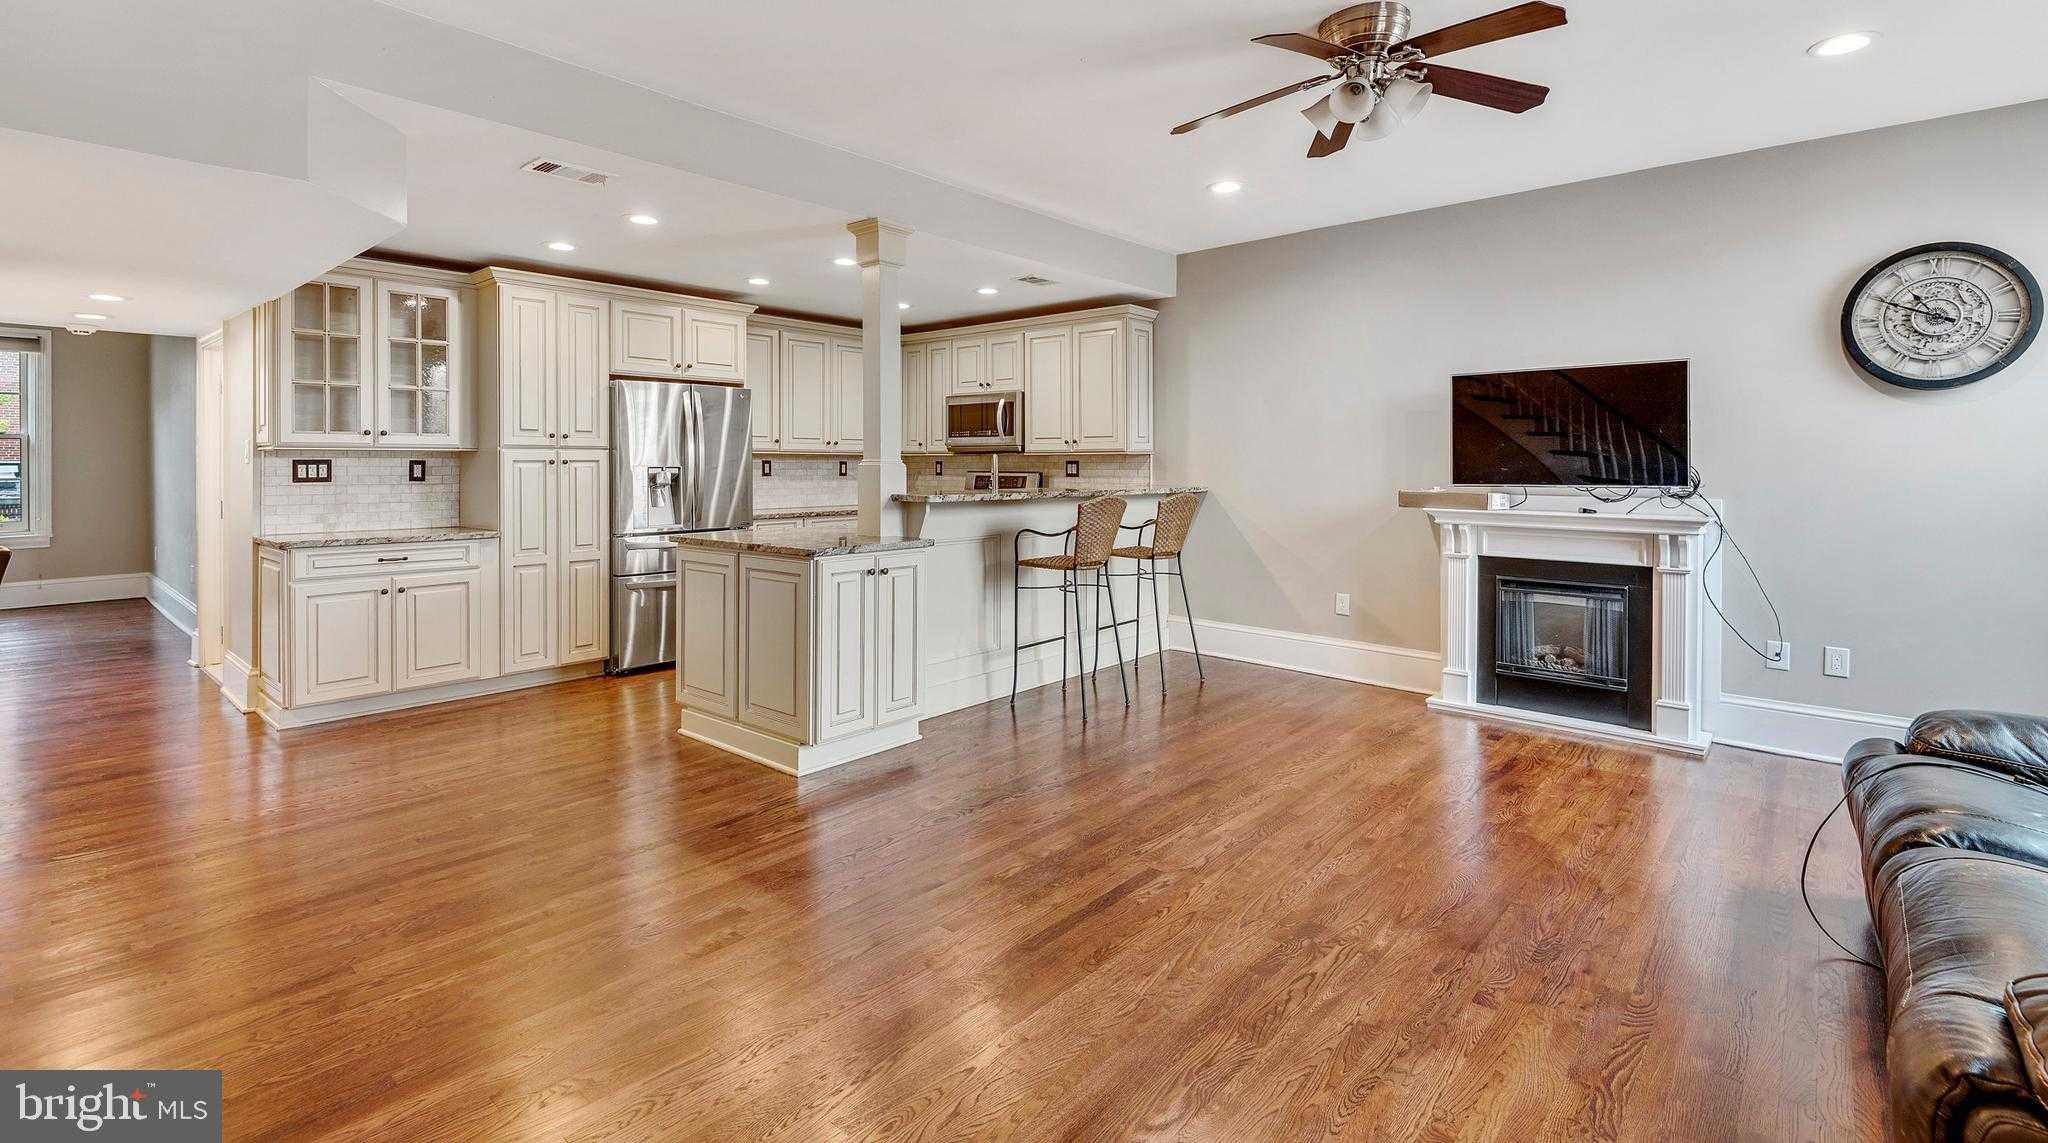 $639,000 - 3Br/2Ba -  for Sale in Washington Sq West, Philadelphia